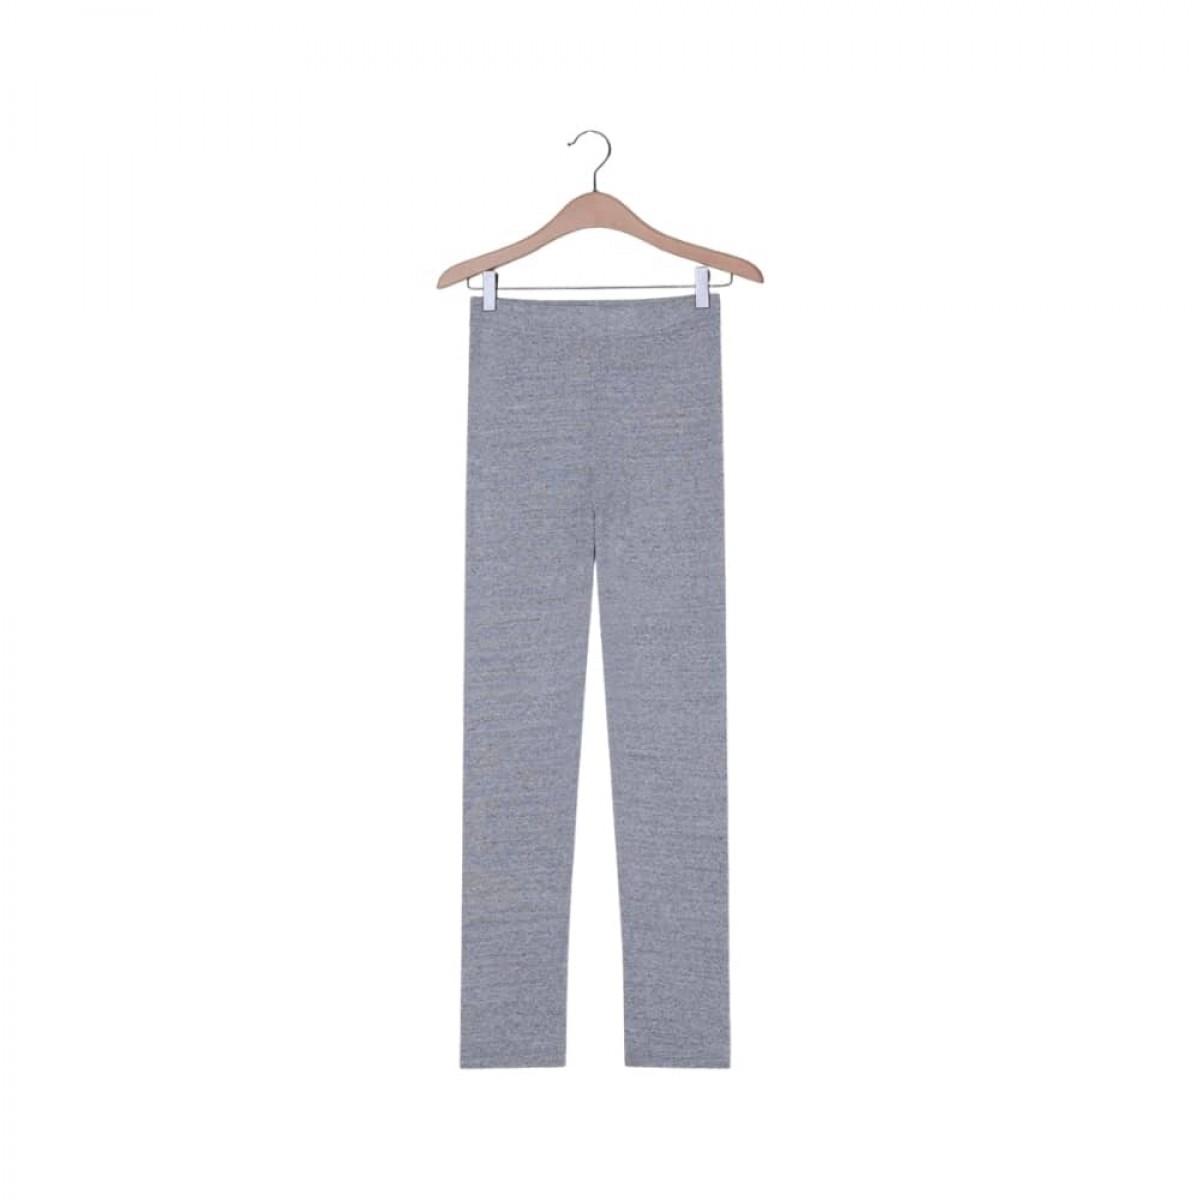 nooby leggins - heather grey - front